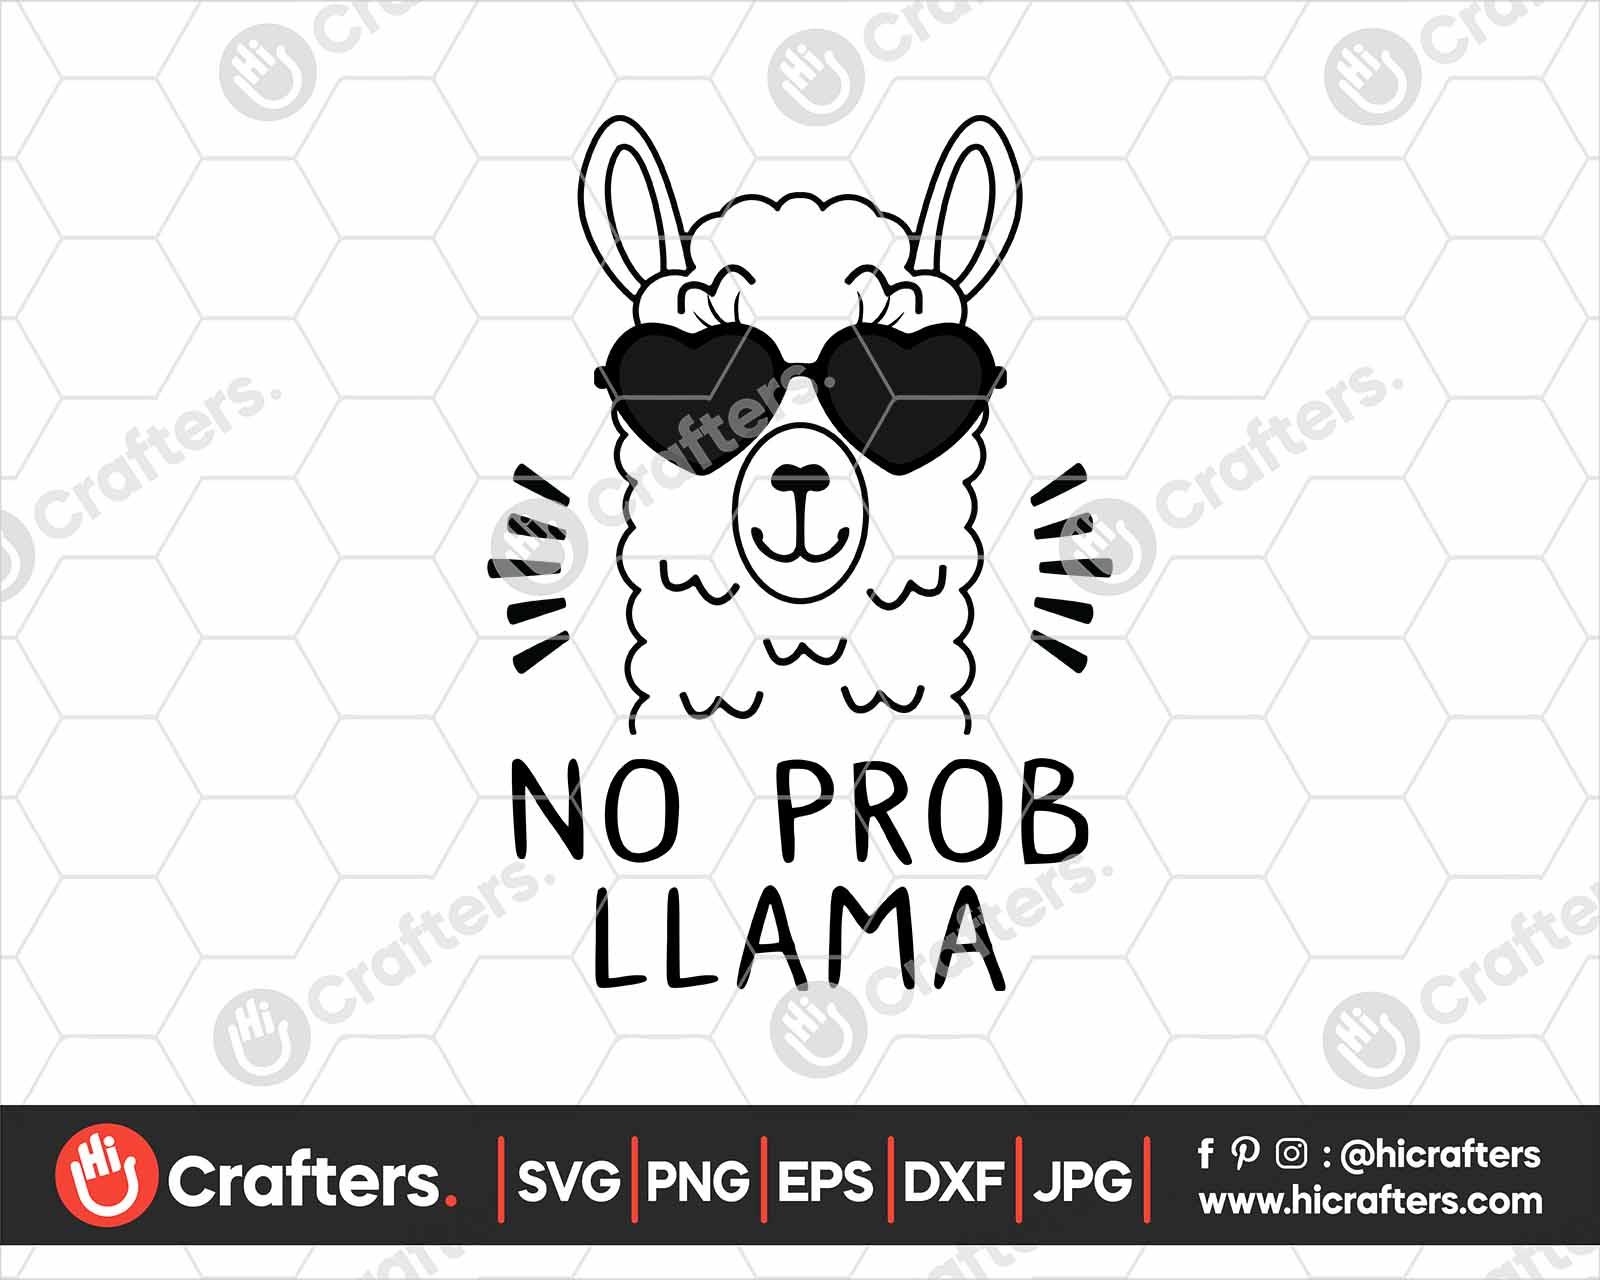 Llama svg Llama in glasses svg no drama llama no prob-llama mama llama cut file design for t-shirt bundle svg